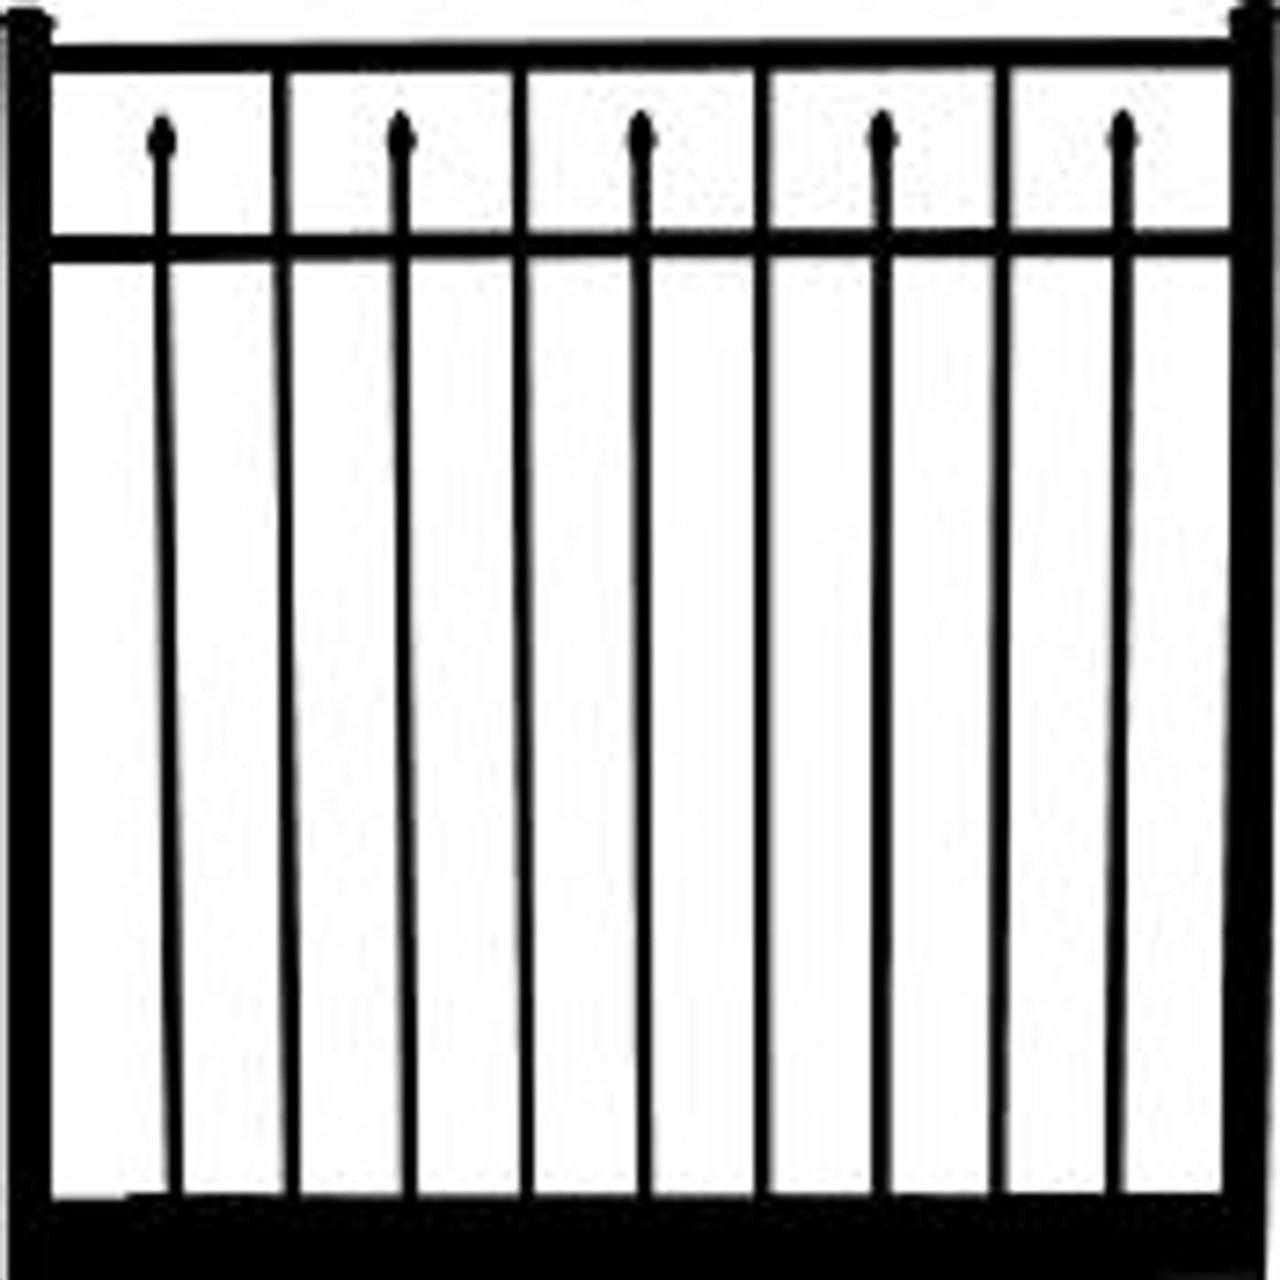 Regis 3233 Standard Aluminum Gate Drawing